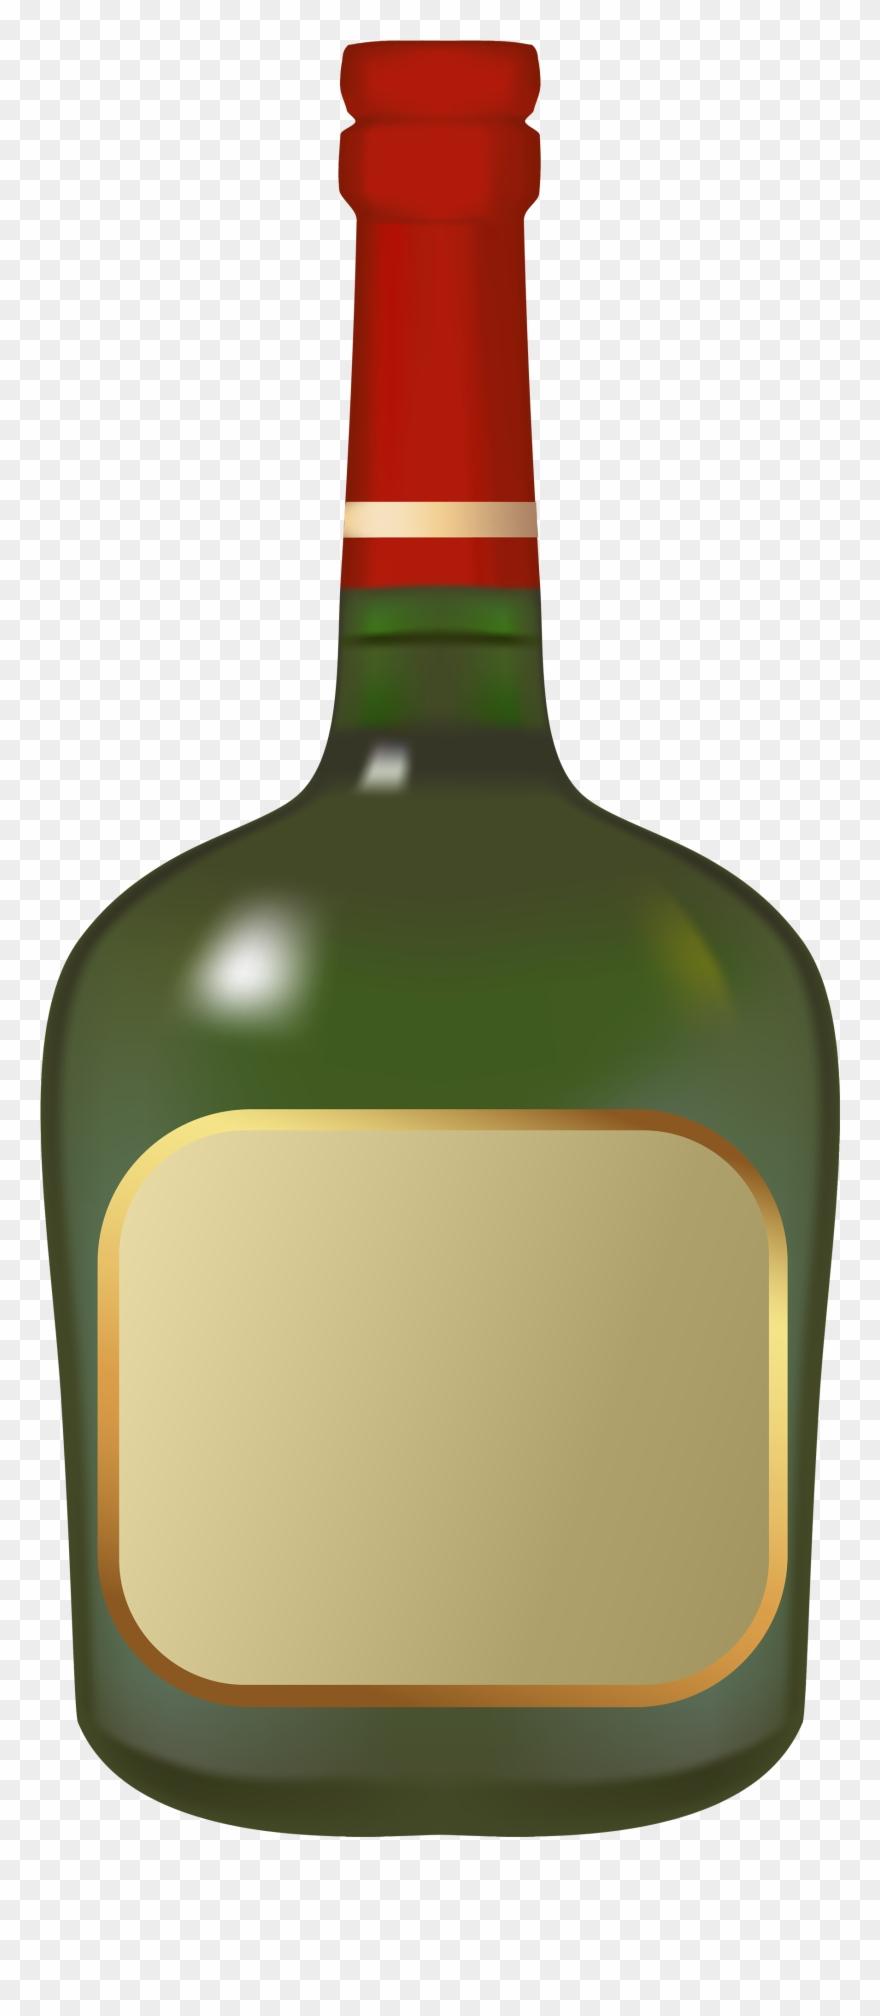 Liquor bottle png cartoon. Drink clipart spirit alcohol